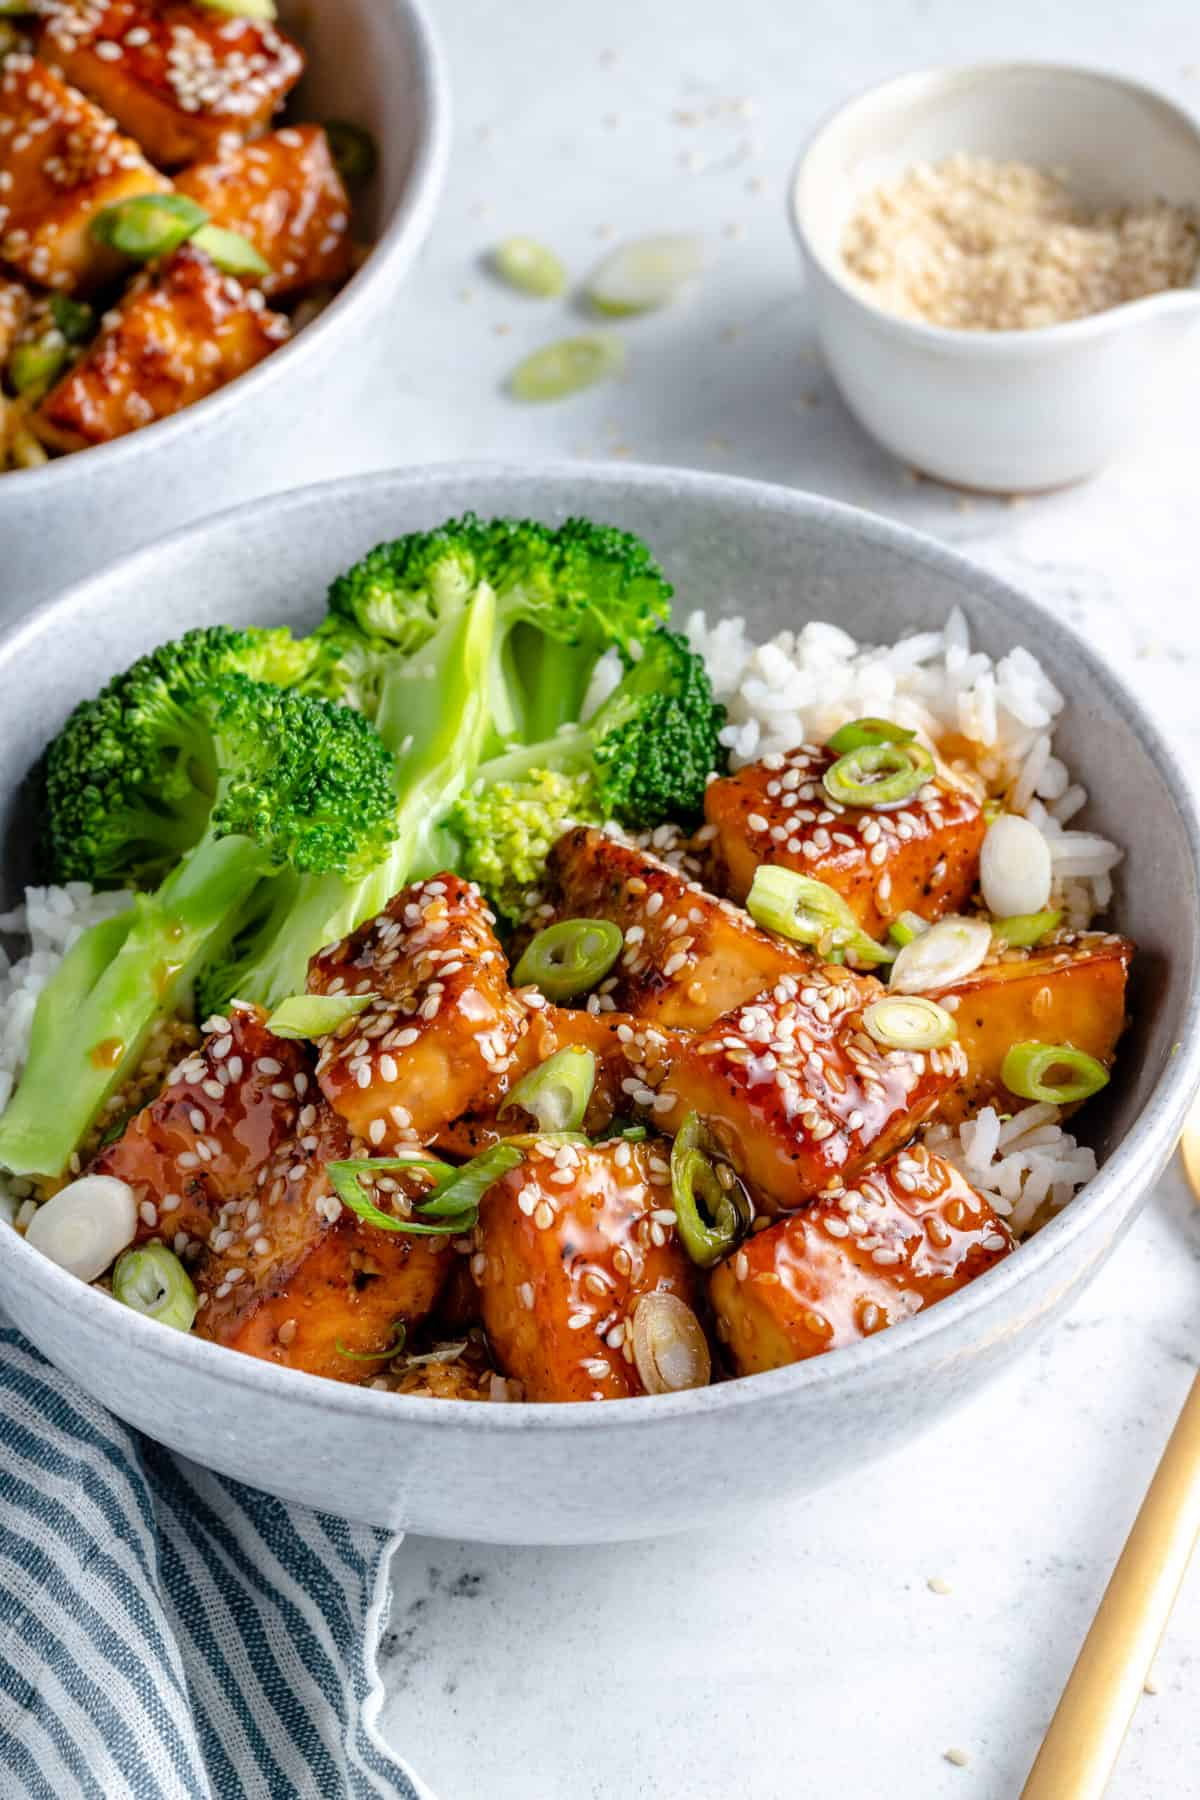 Teriyaki tofu with broccoli and white rice.